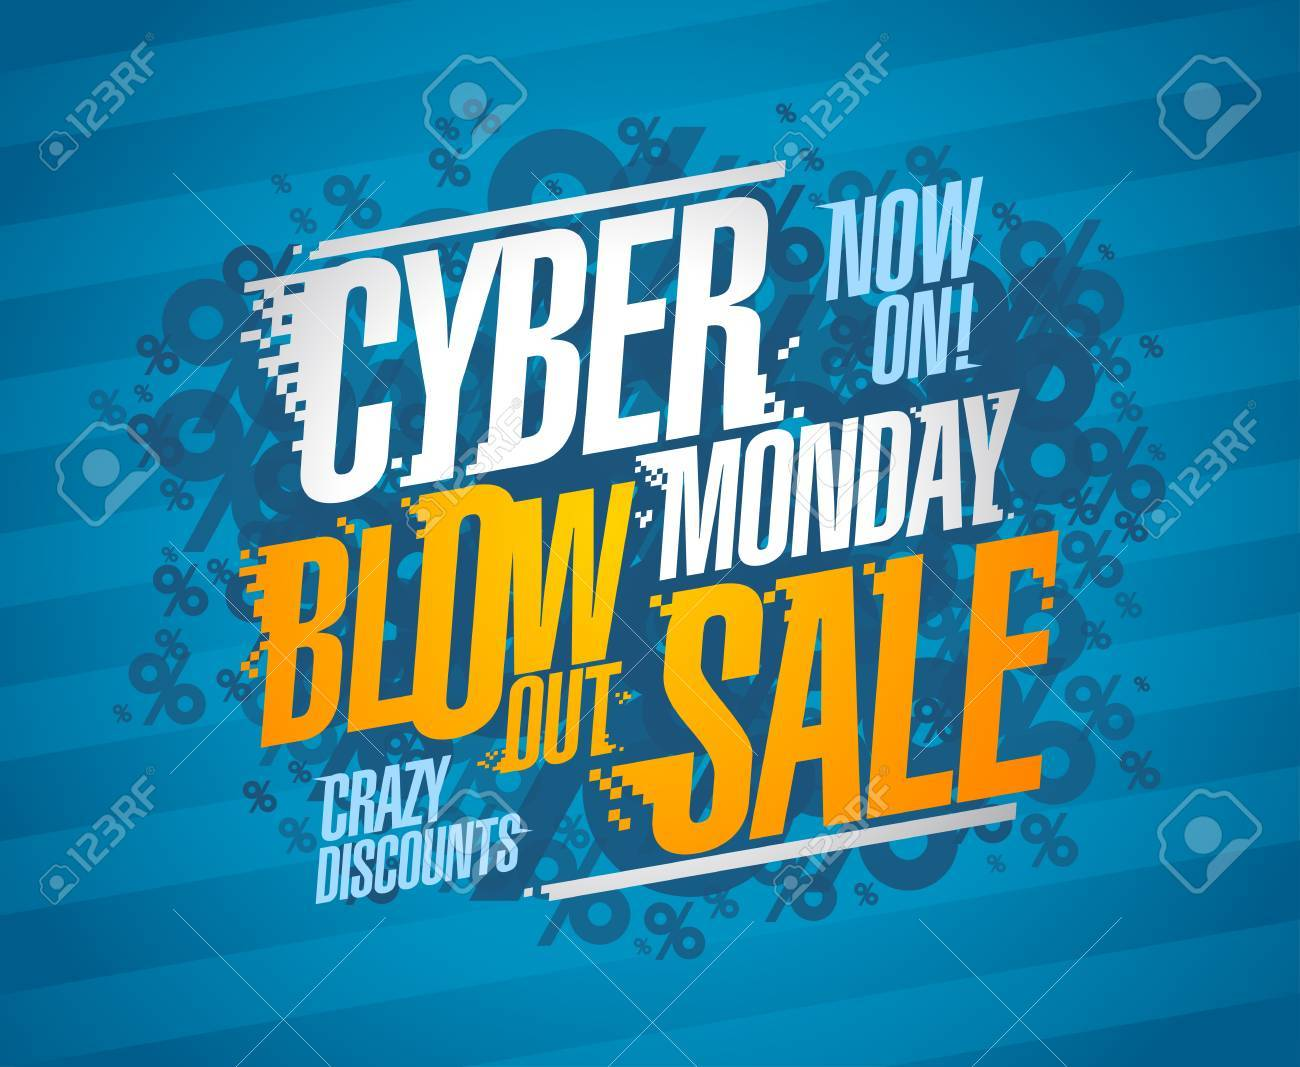 b74fbf5eb50 Cyber monday blow out sale, crazy discounts poster